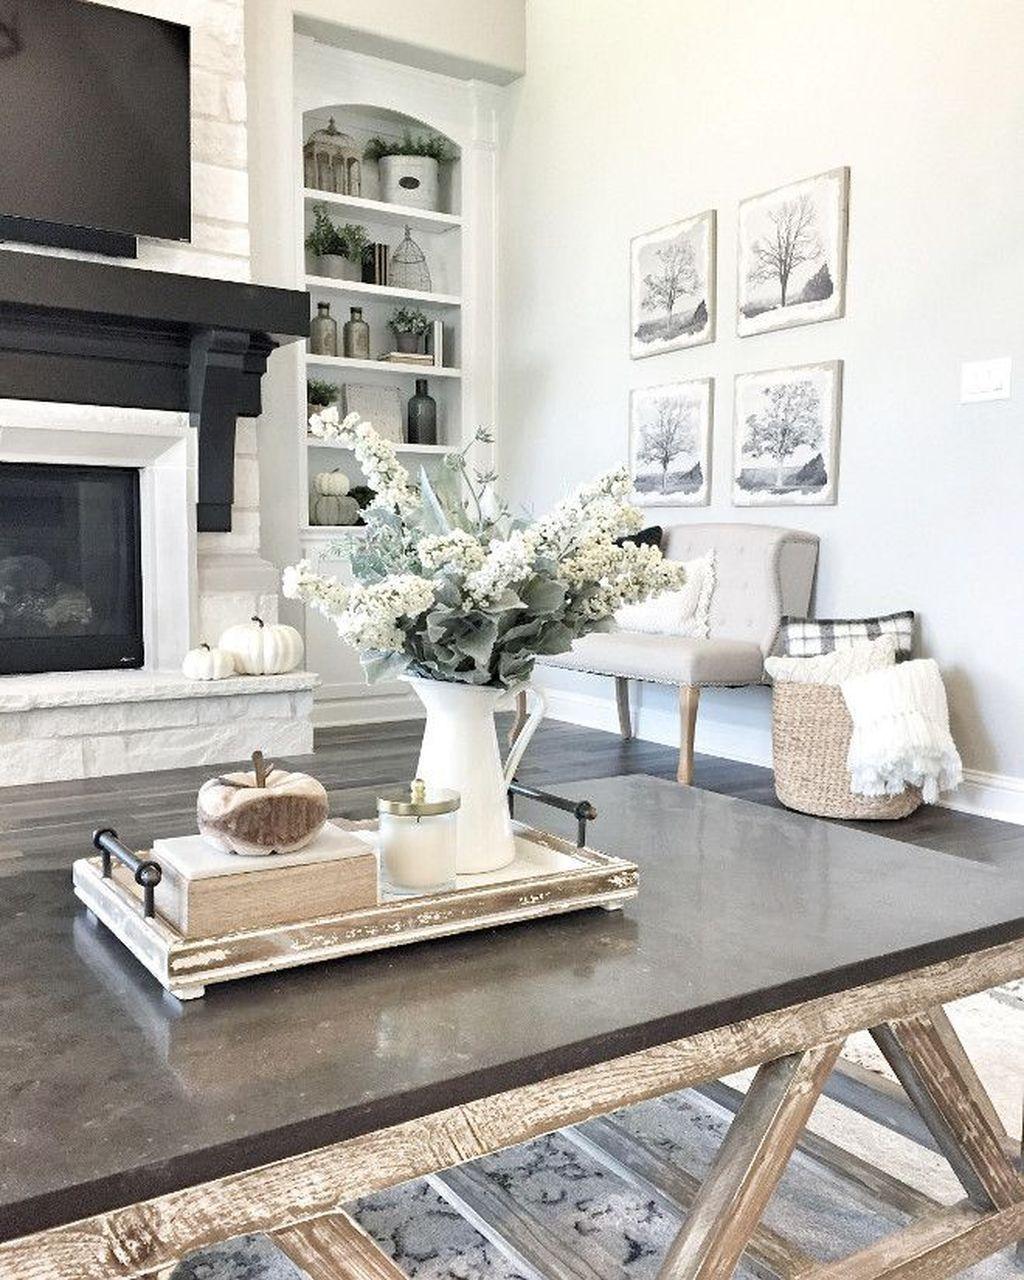 48 Gorgeous Coffee Table Design Ideas - HOMYHOMEE ...